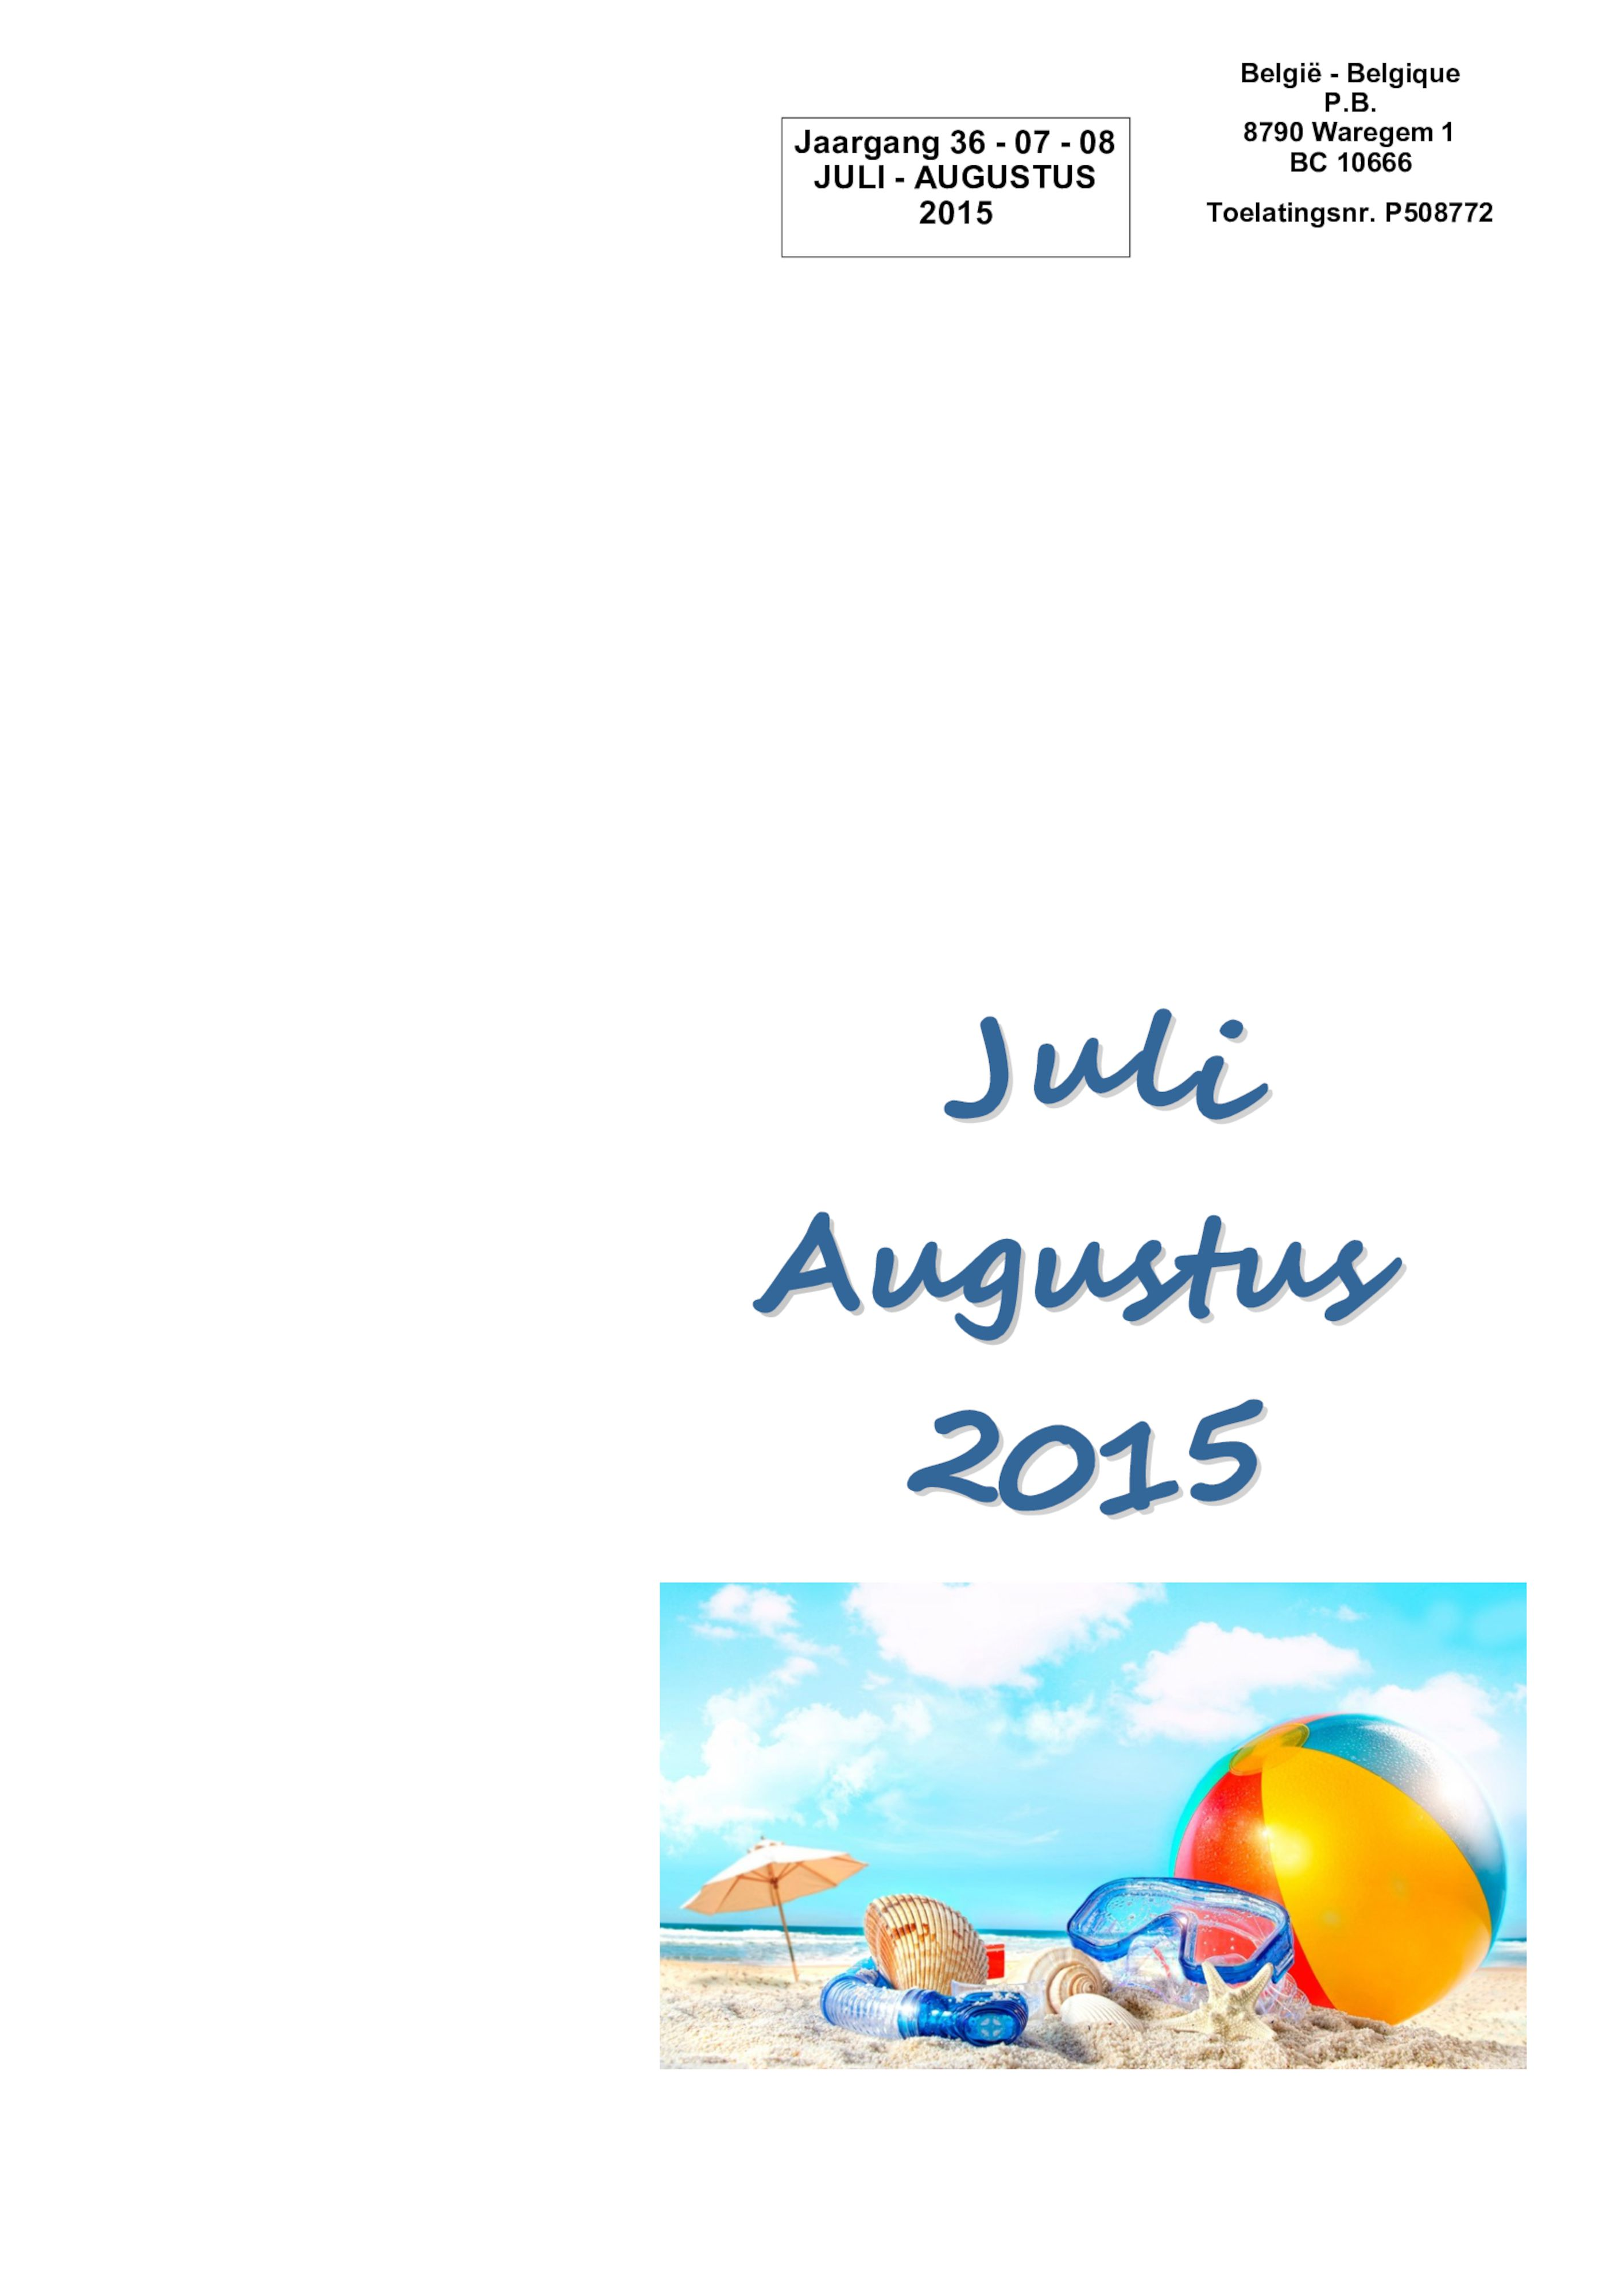 De Belle juli augustus 2015